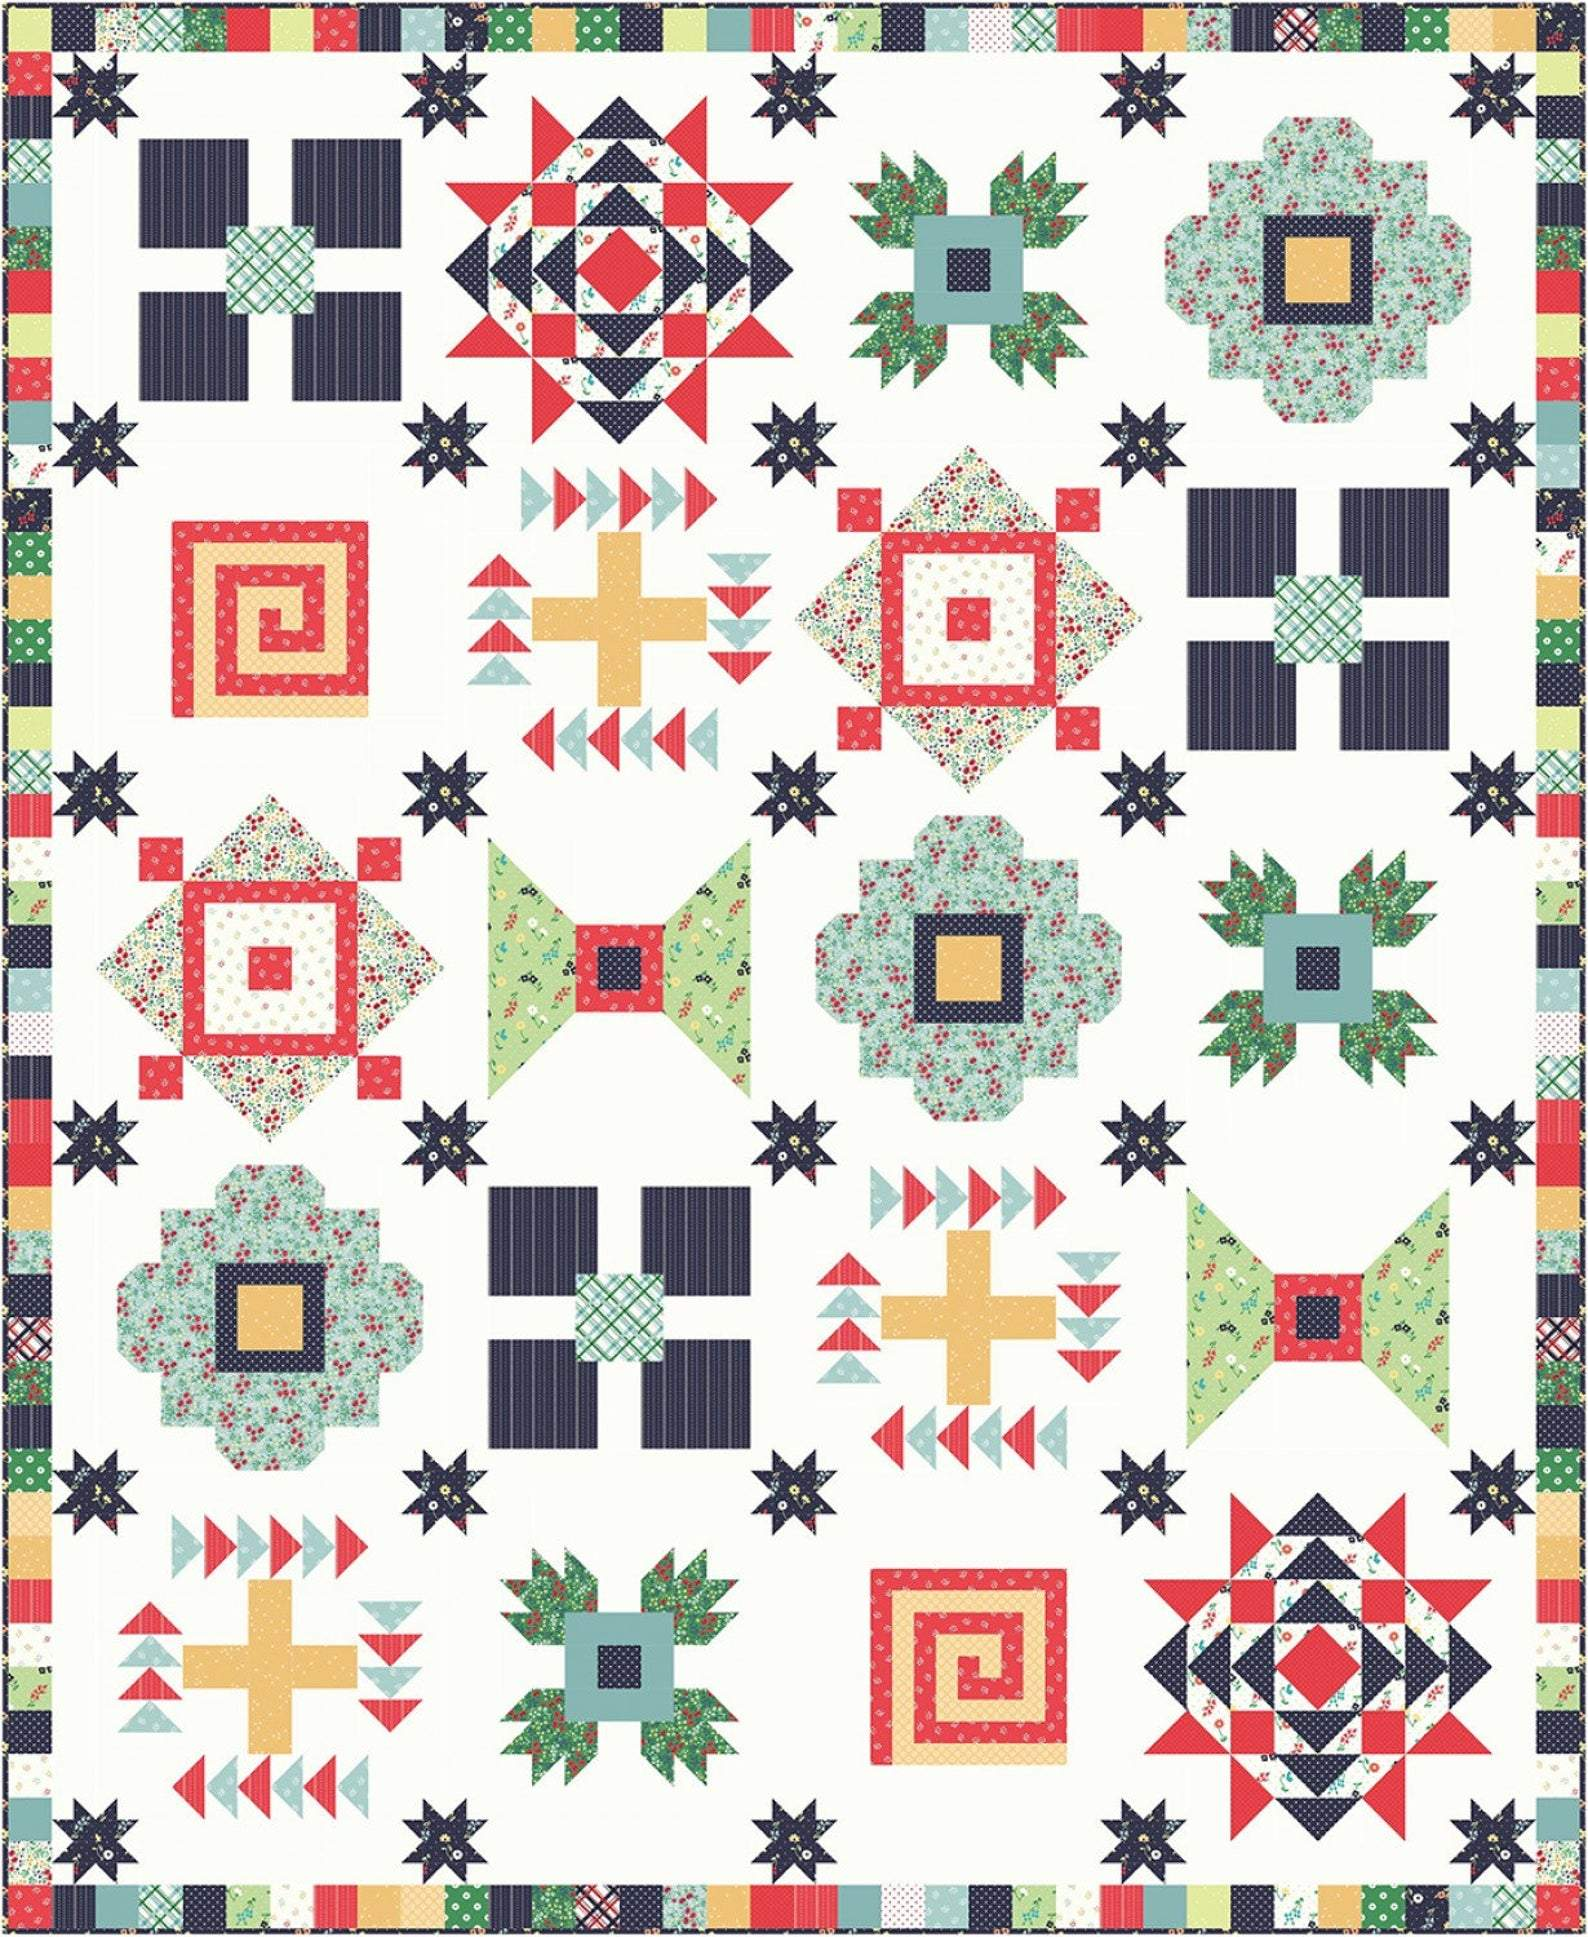 Sugar House Picnic Quilt Kit, 72 x 85, Riley Blake, Amy Smart, KT0216